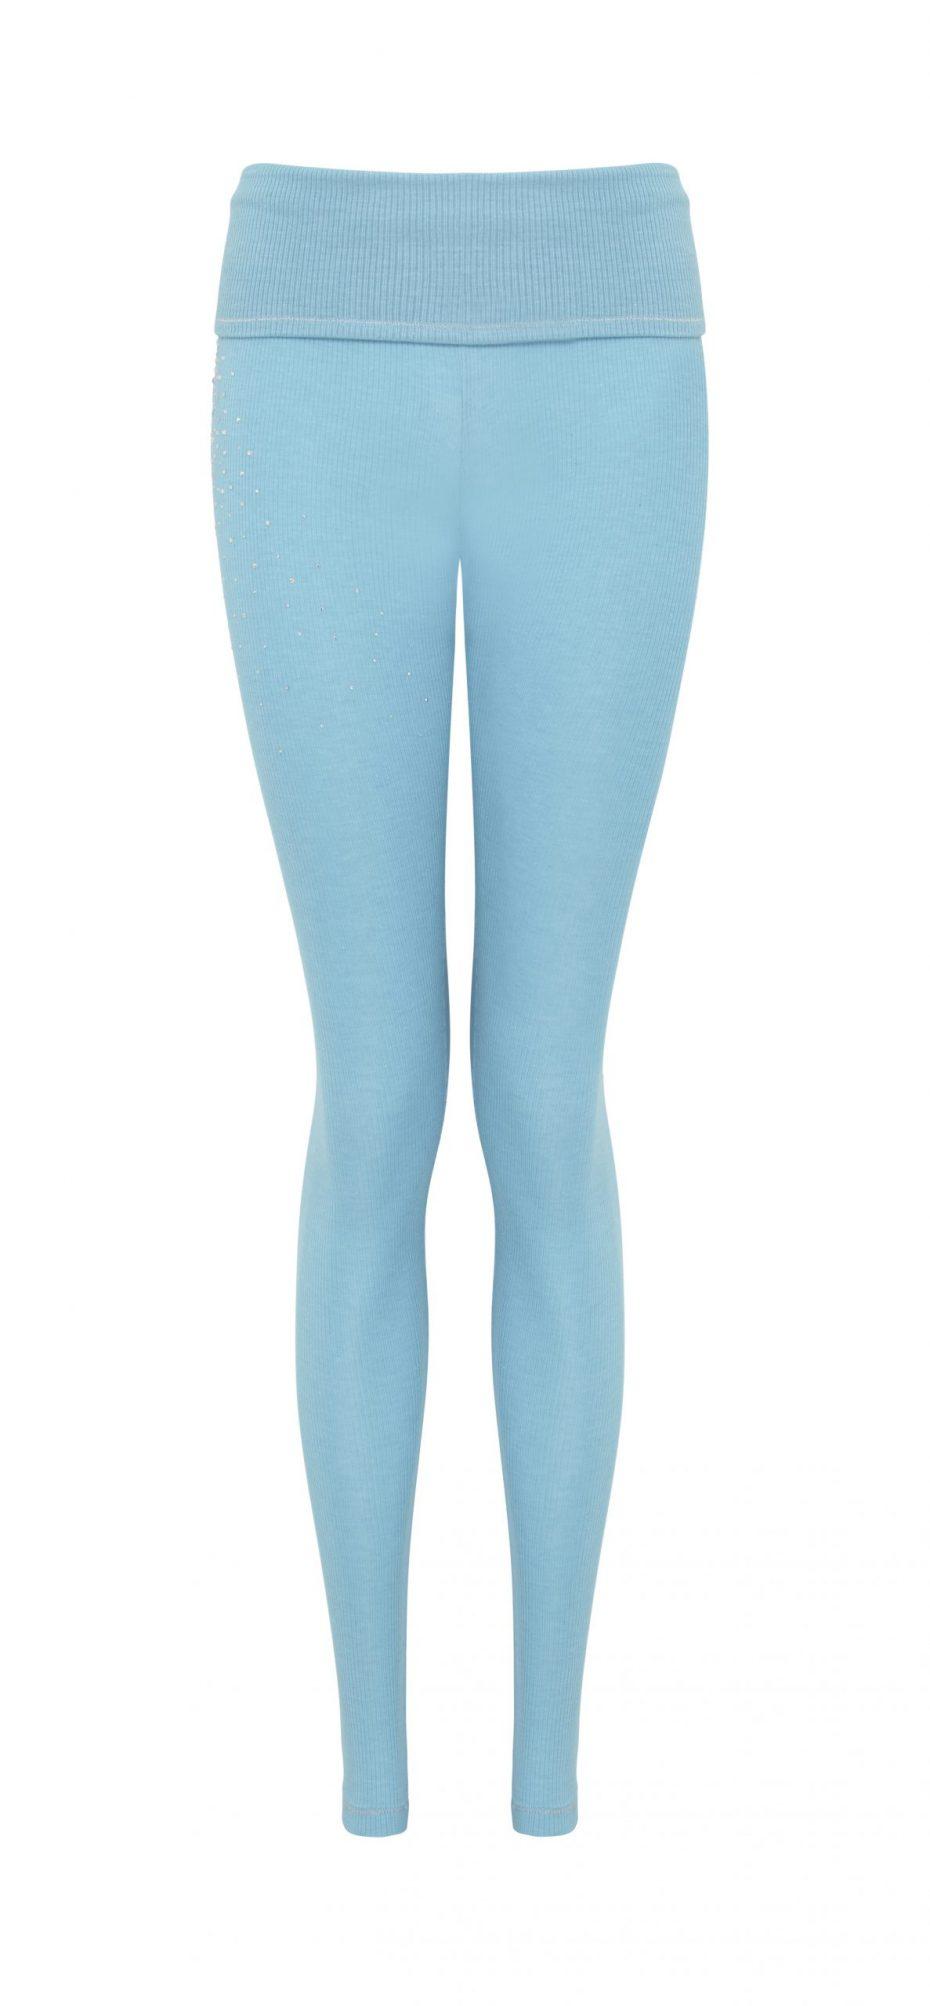 S'No Queen CLASSIC leggings: Tiffany Blue-358